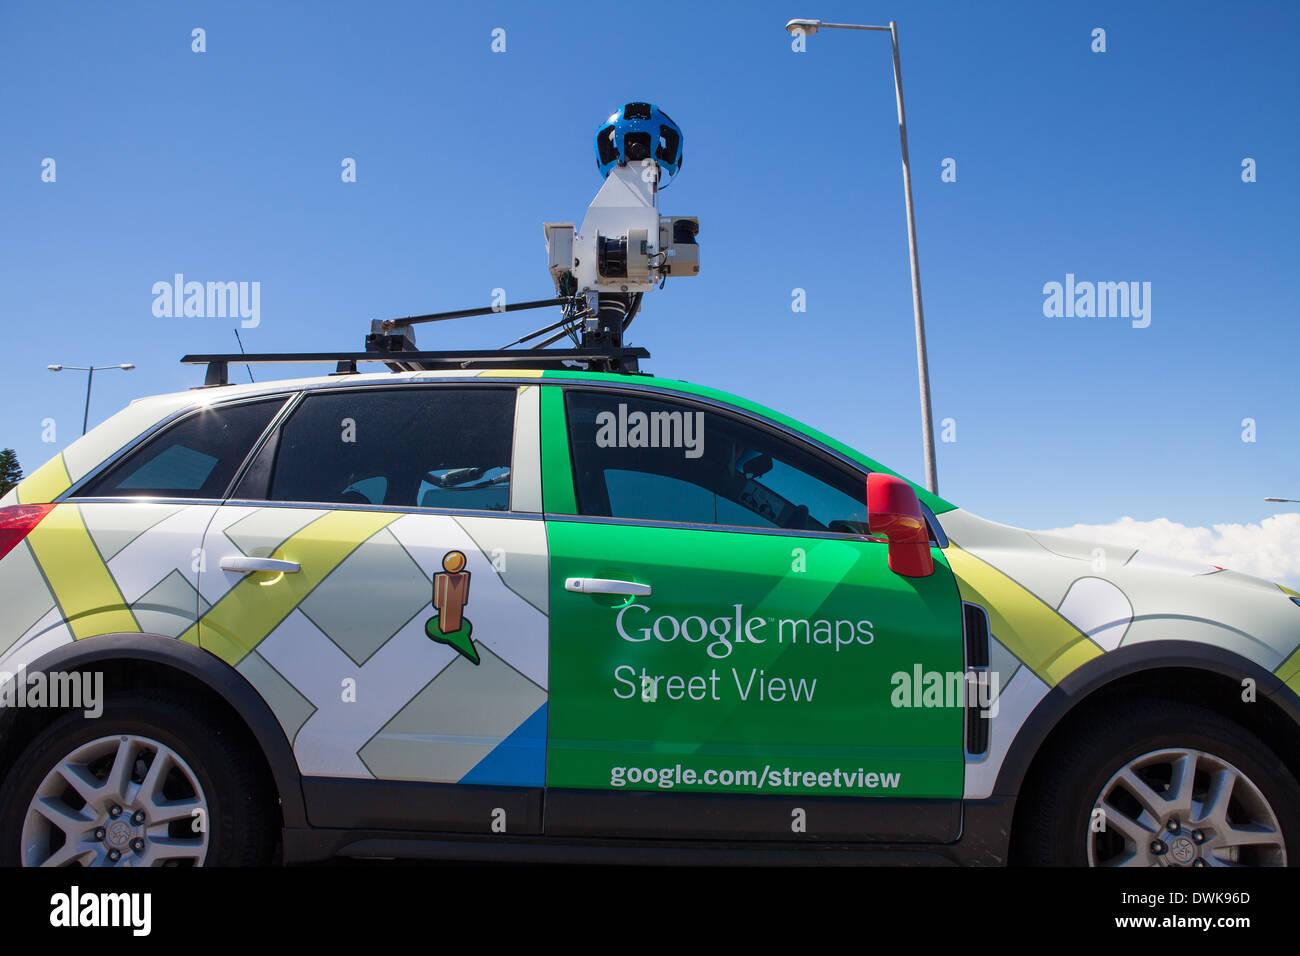 Where I Parked My Car Google Maps